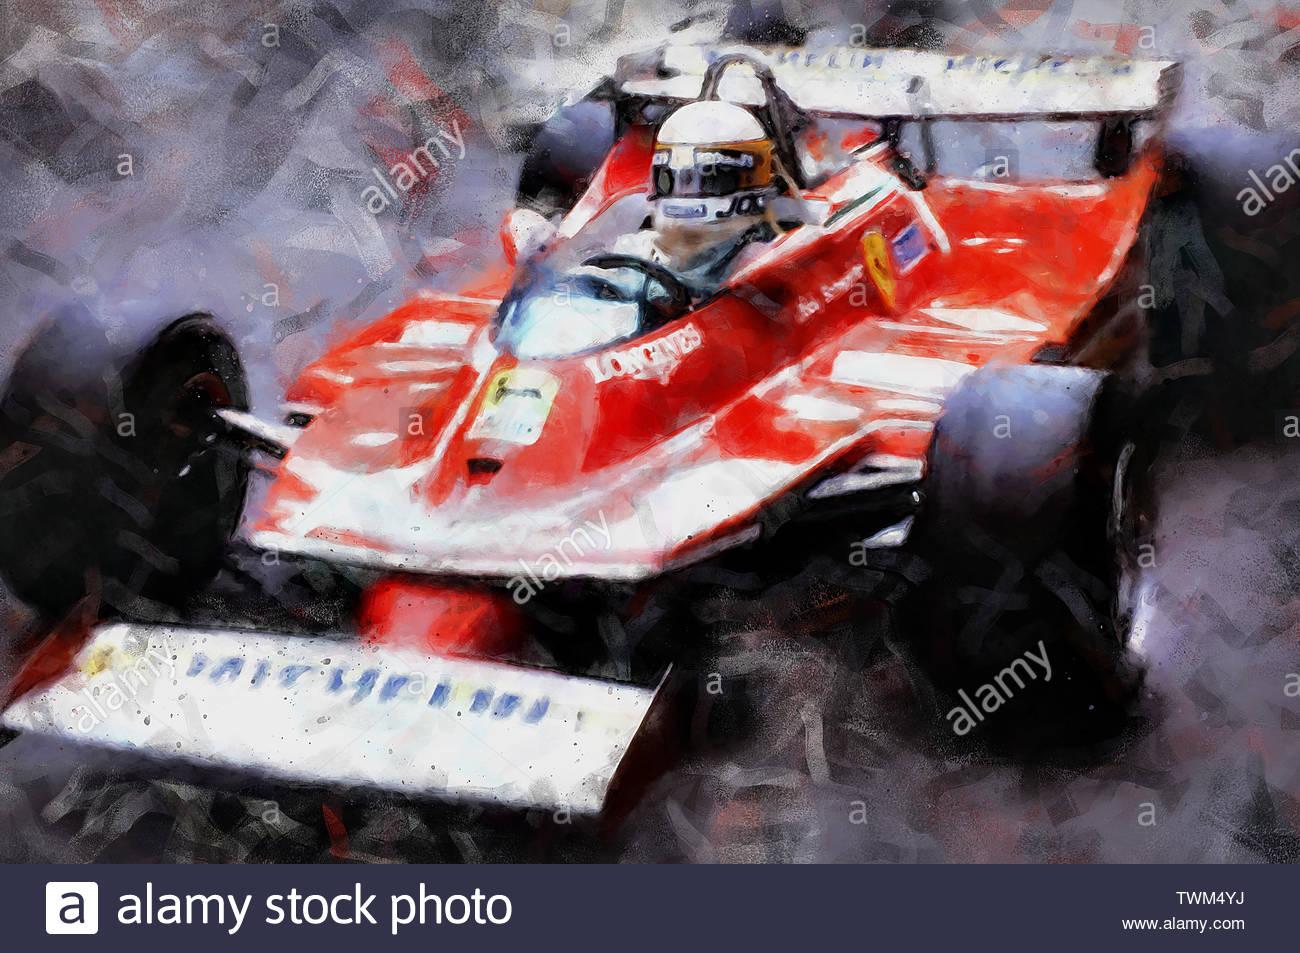 Scheckter Stock Photos & Scheckter Stock Images - Alamy